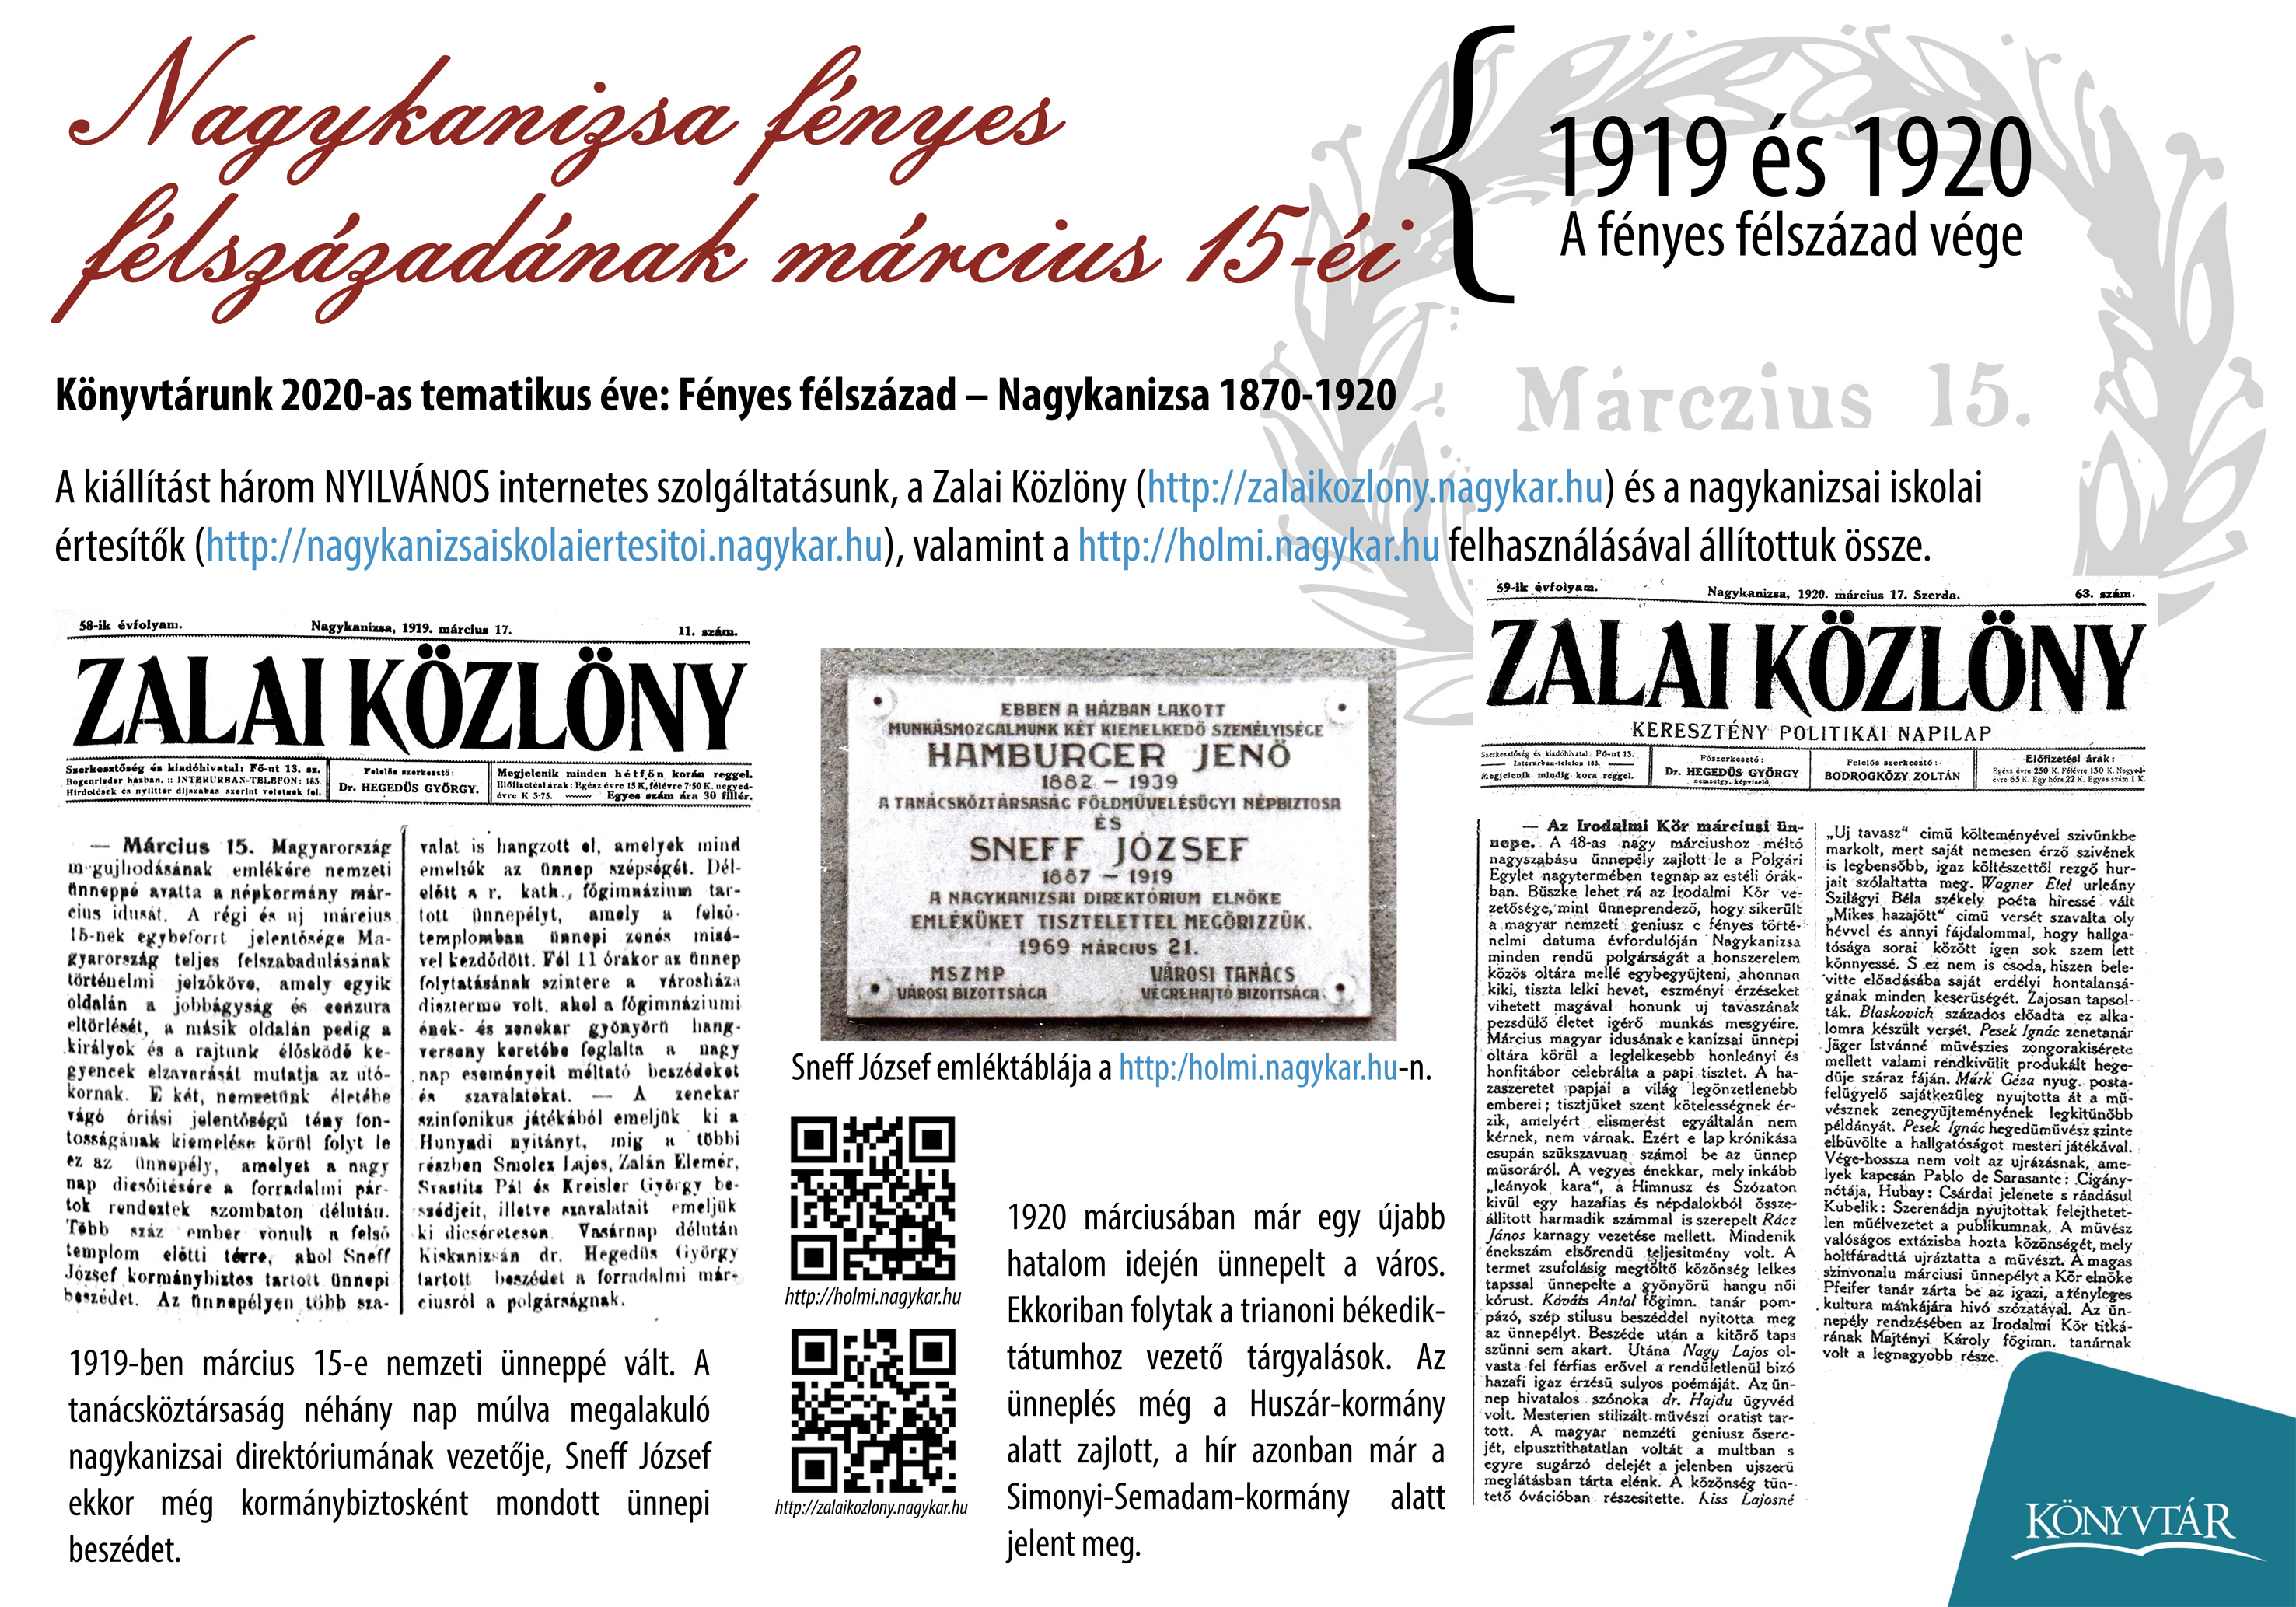 http://www.nagykar.hu/keptar/8123/65408/open.html